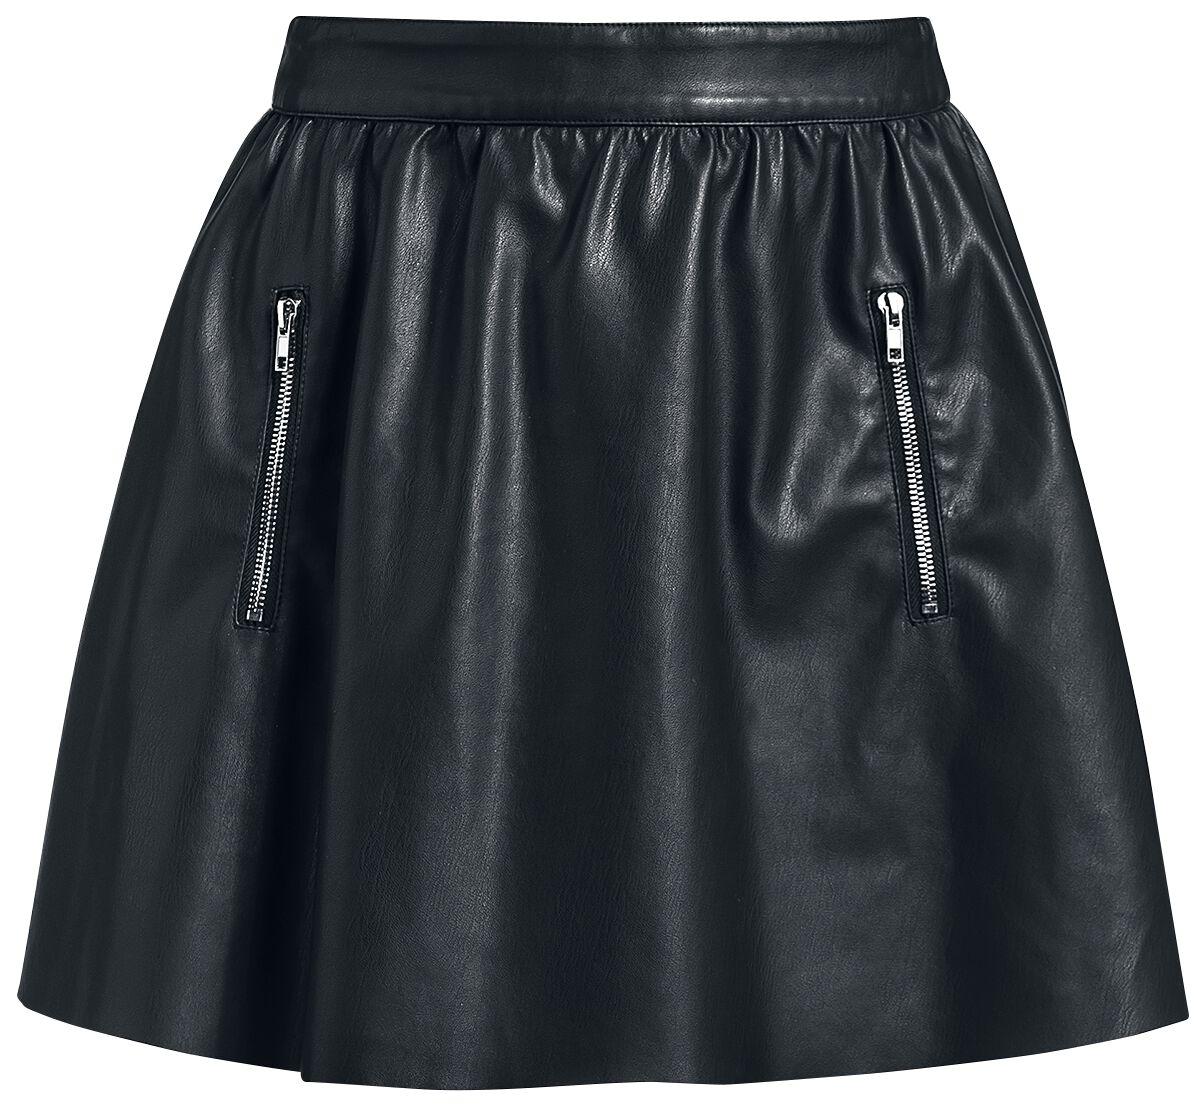 Image of   Fashion Victim Fashion PU Skirt Nederdel sort